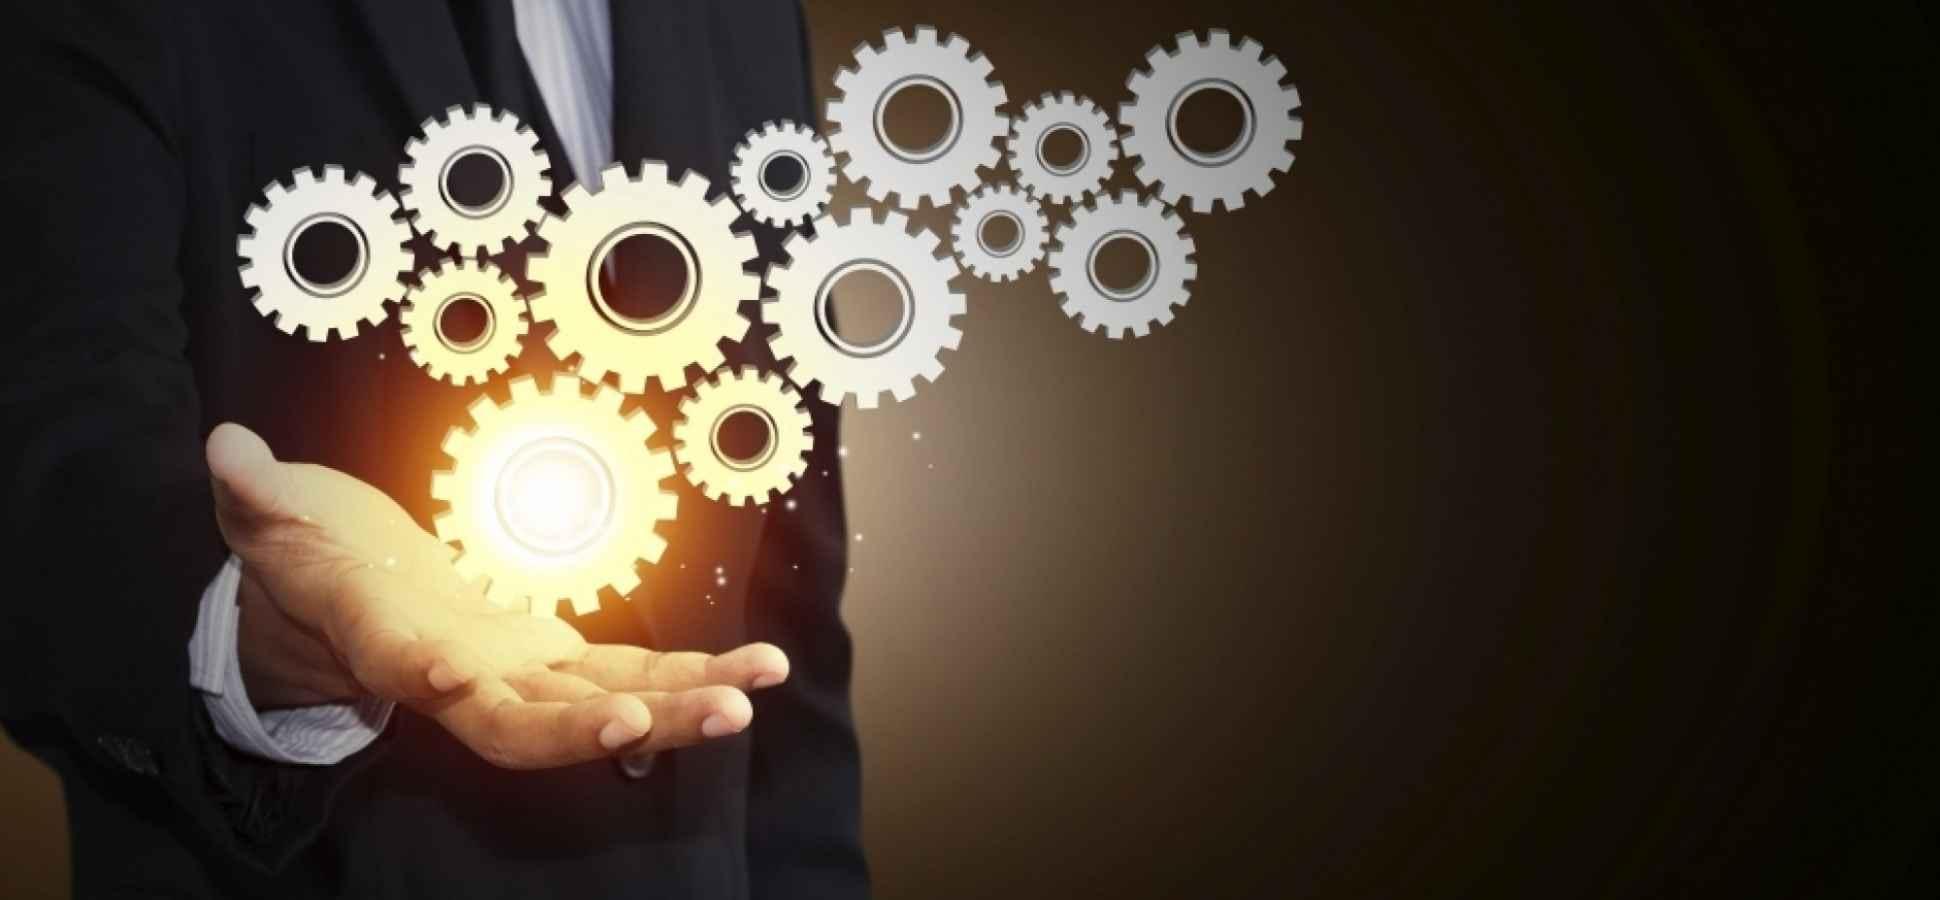 3 Hacks for Optimizing for Productivity From Asana Co-Founder Justin Rosenstein